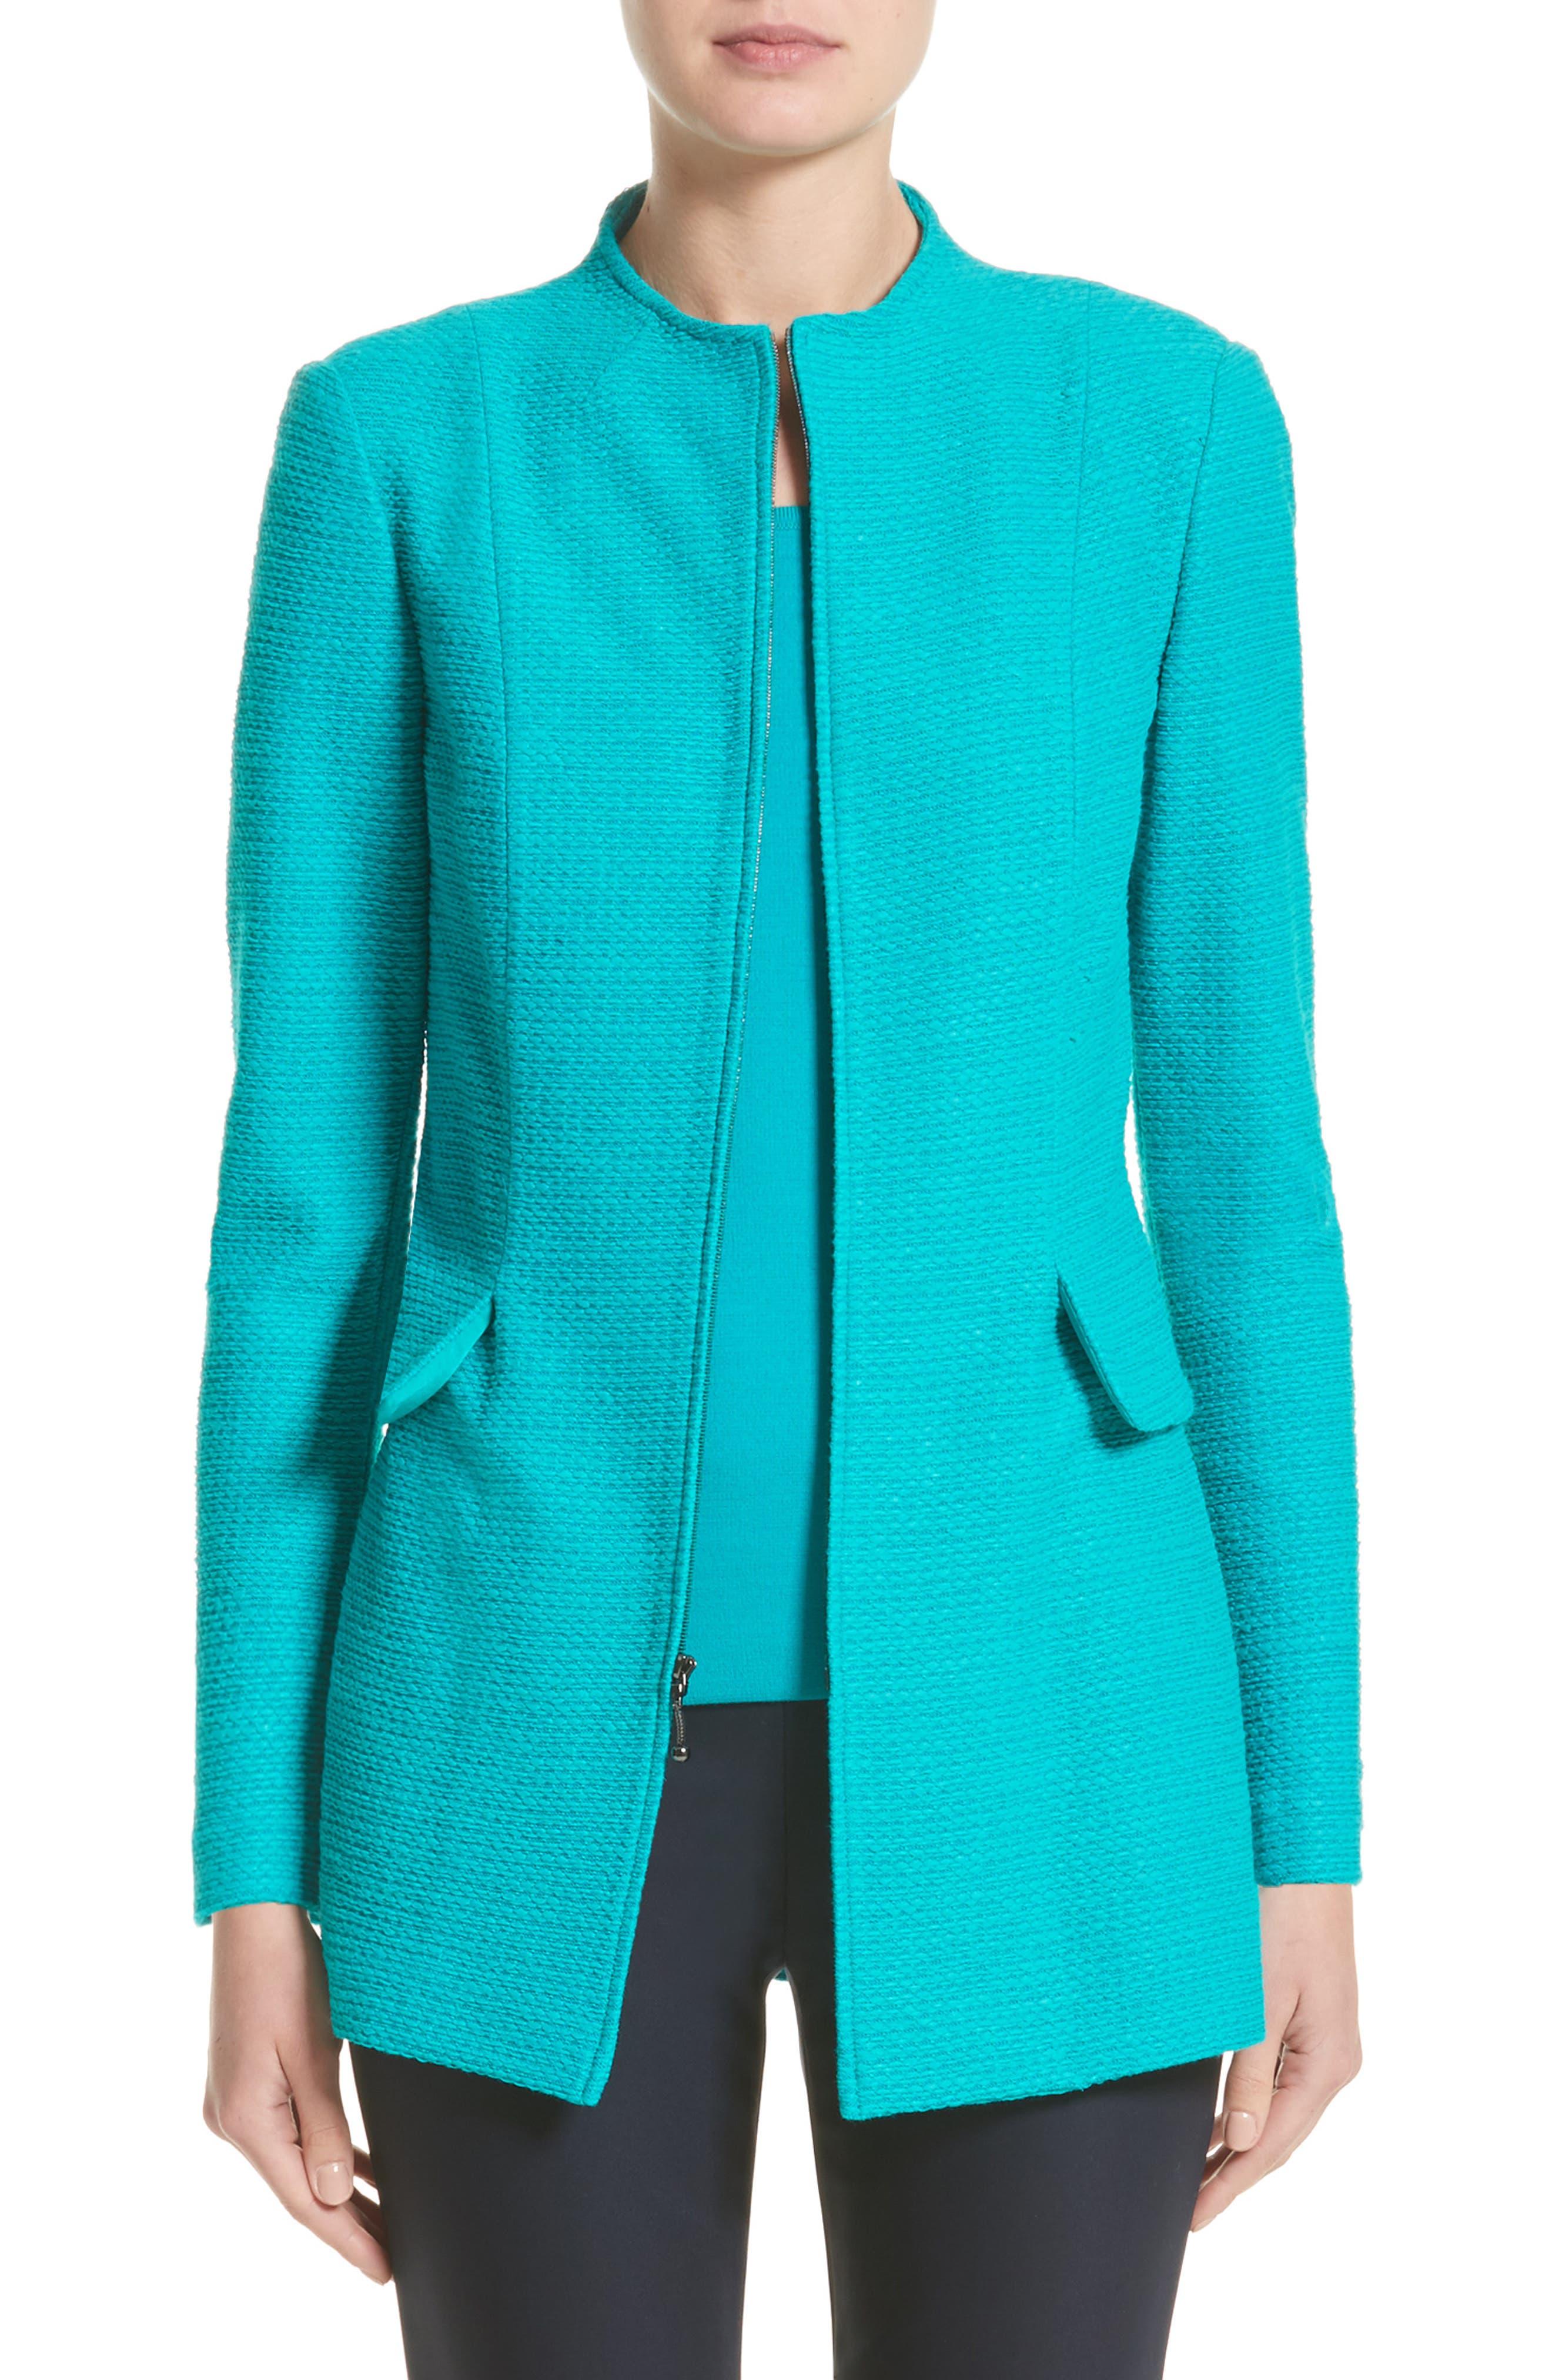 Sheen Tape Knit Jacket,                         Main,                         color, 440